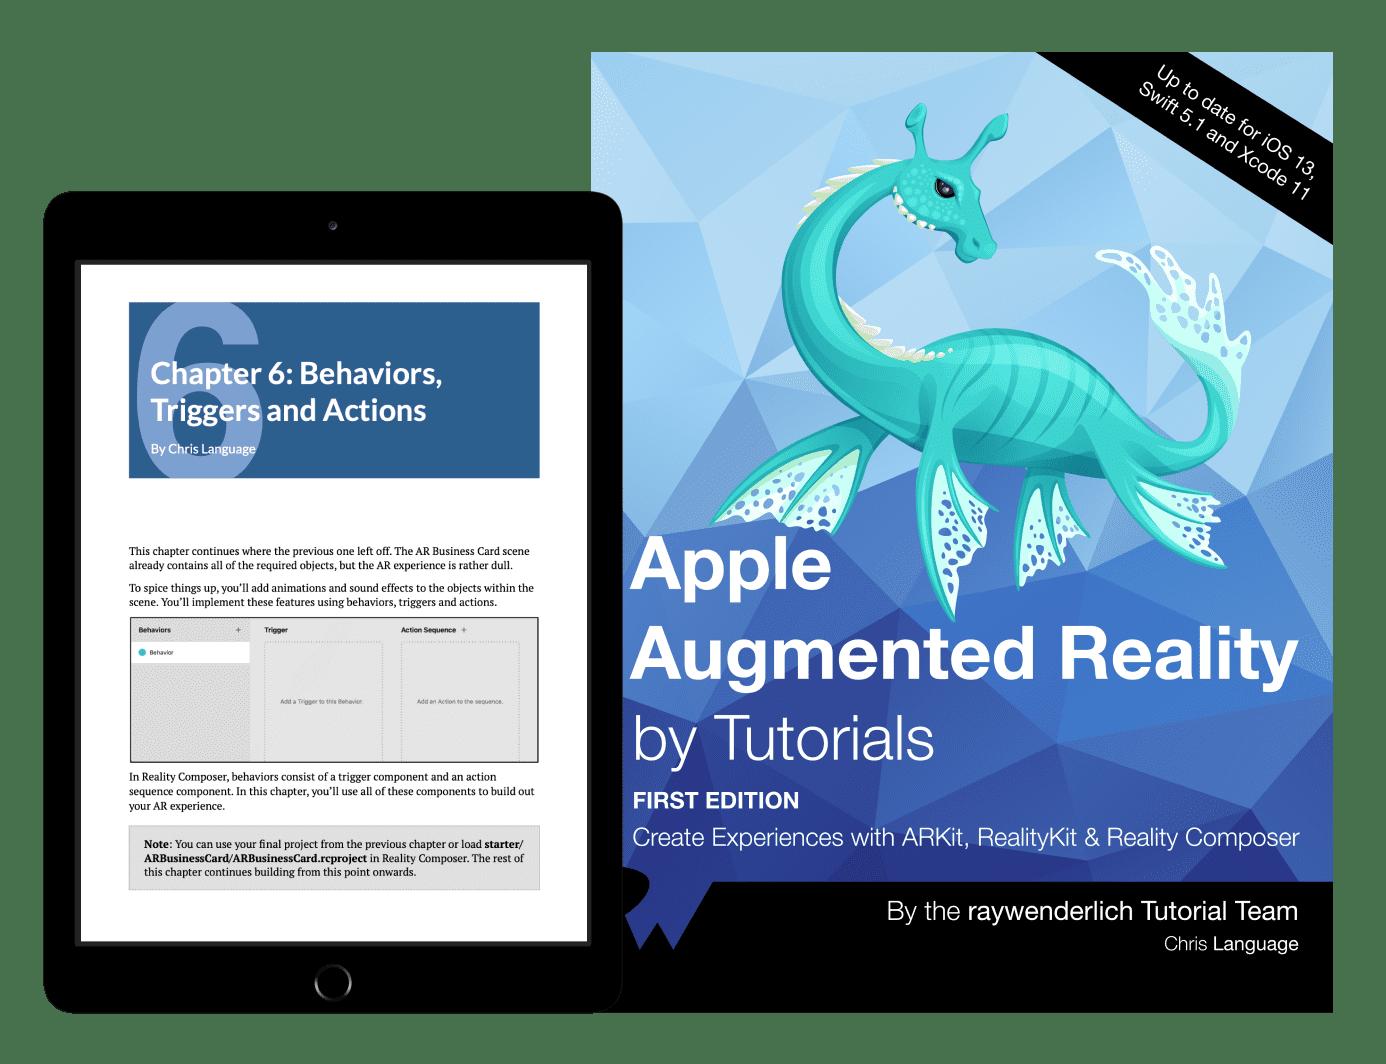 Apple AR by Tutorials